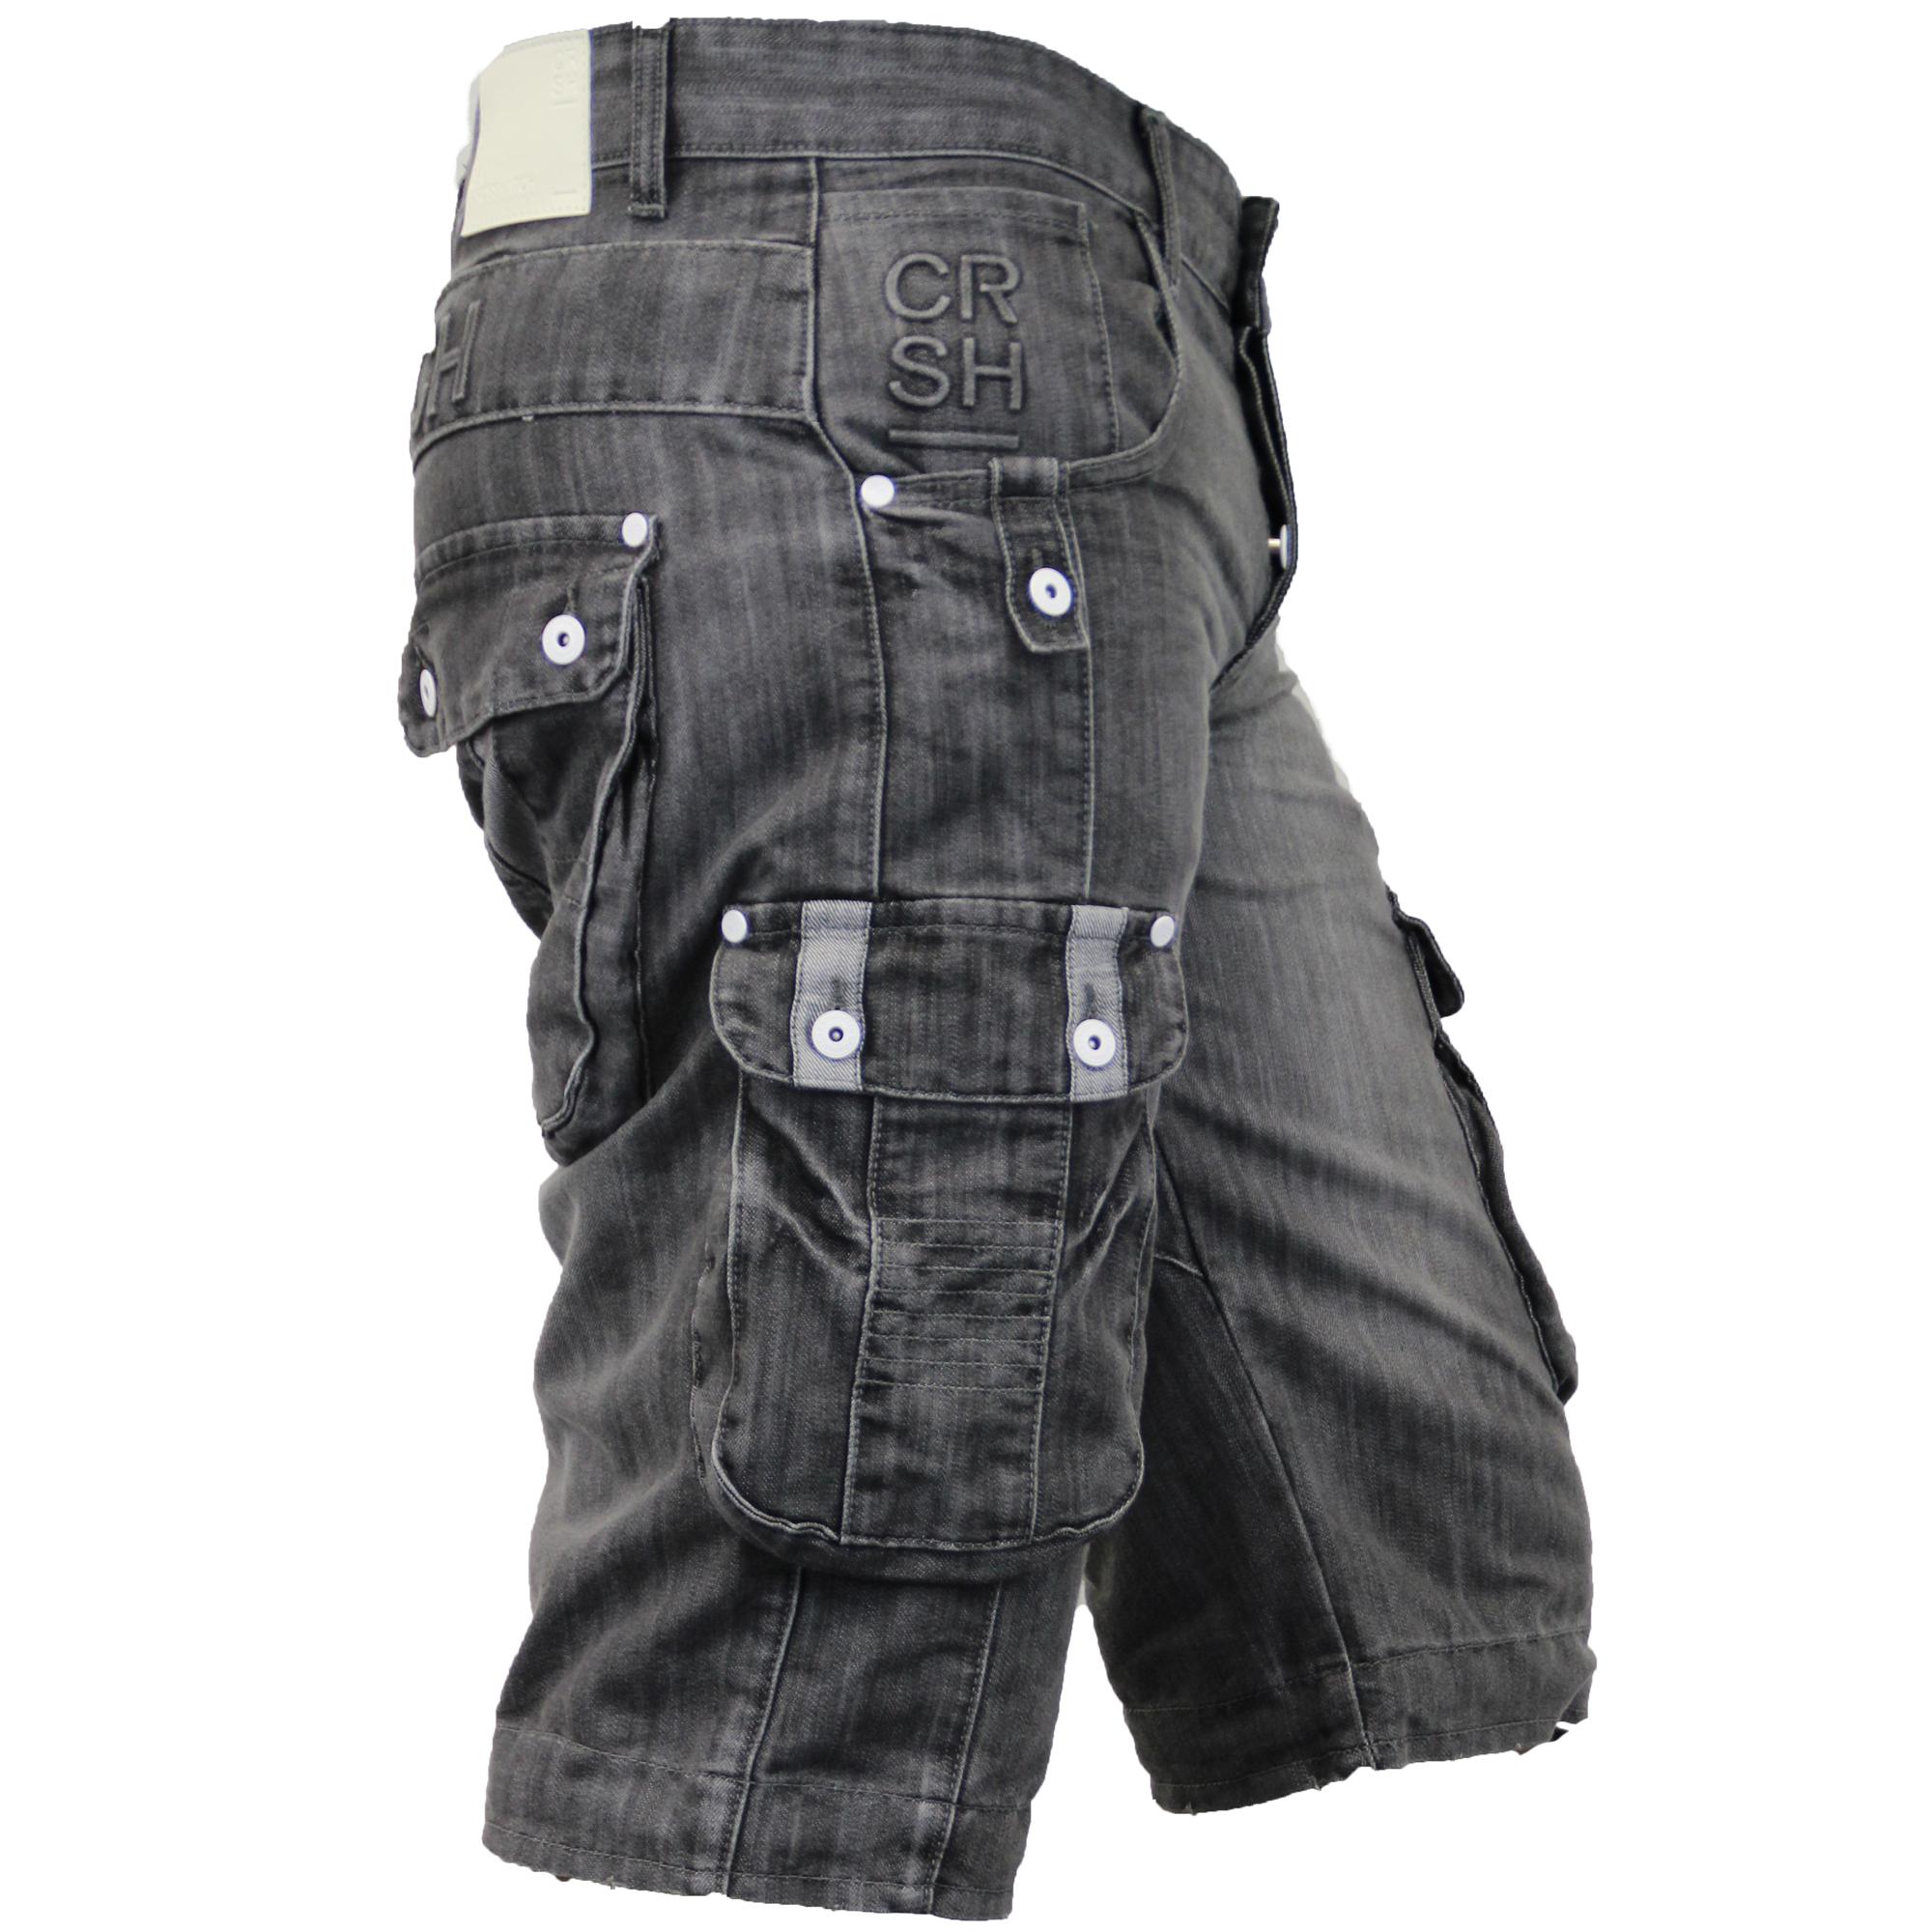 Mens-Denim-Knee-Length-Combat-Shorts-By-Crosshatch thumbnail 10